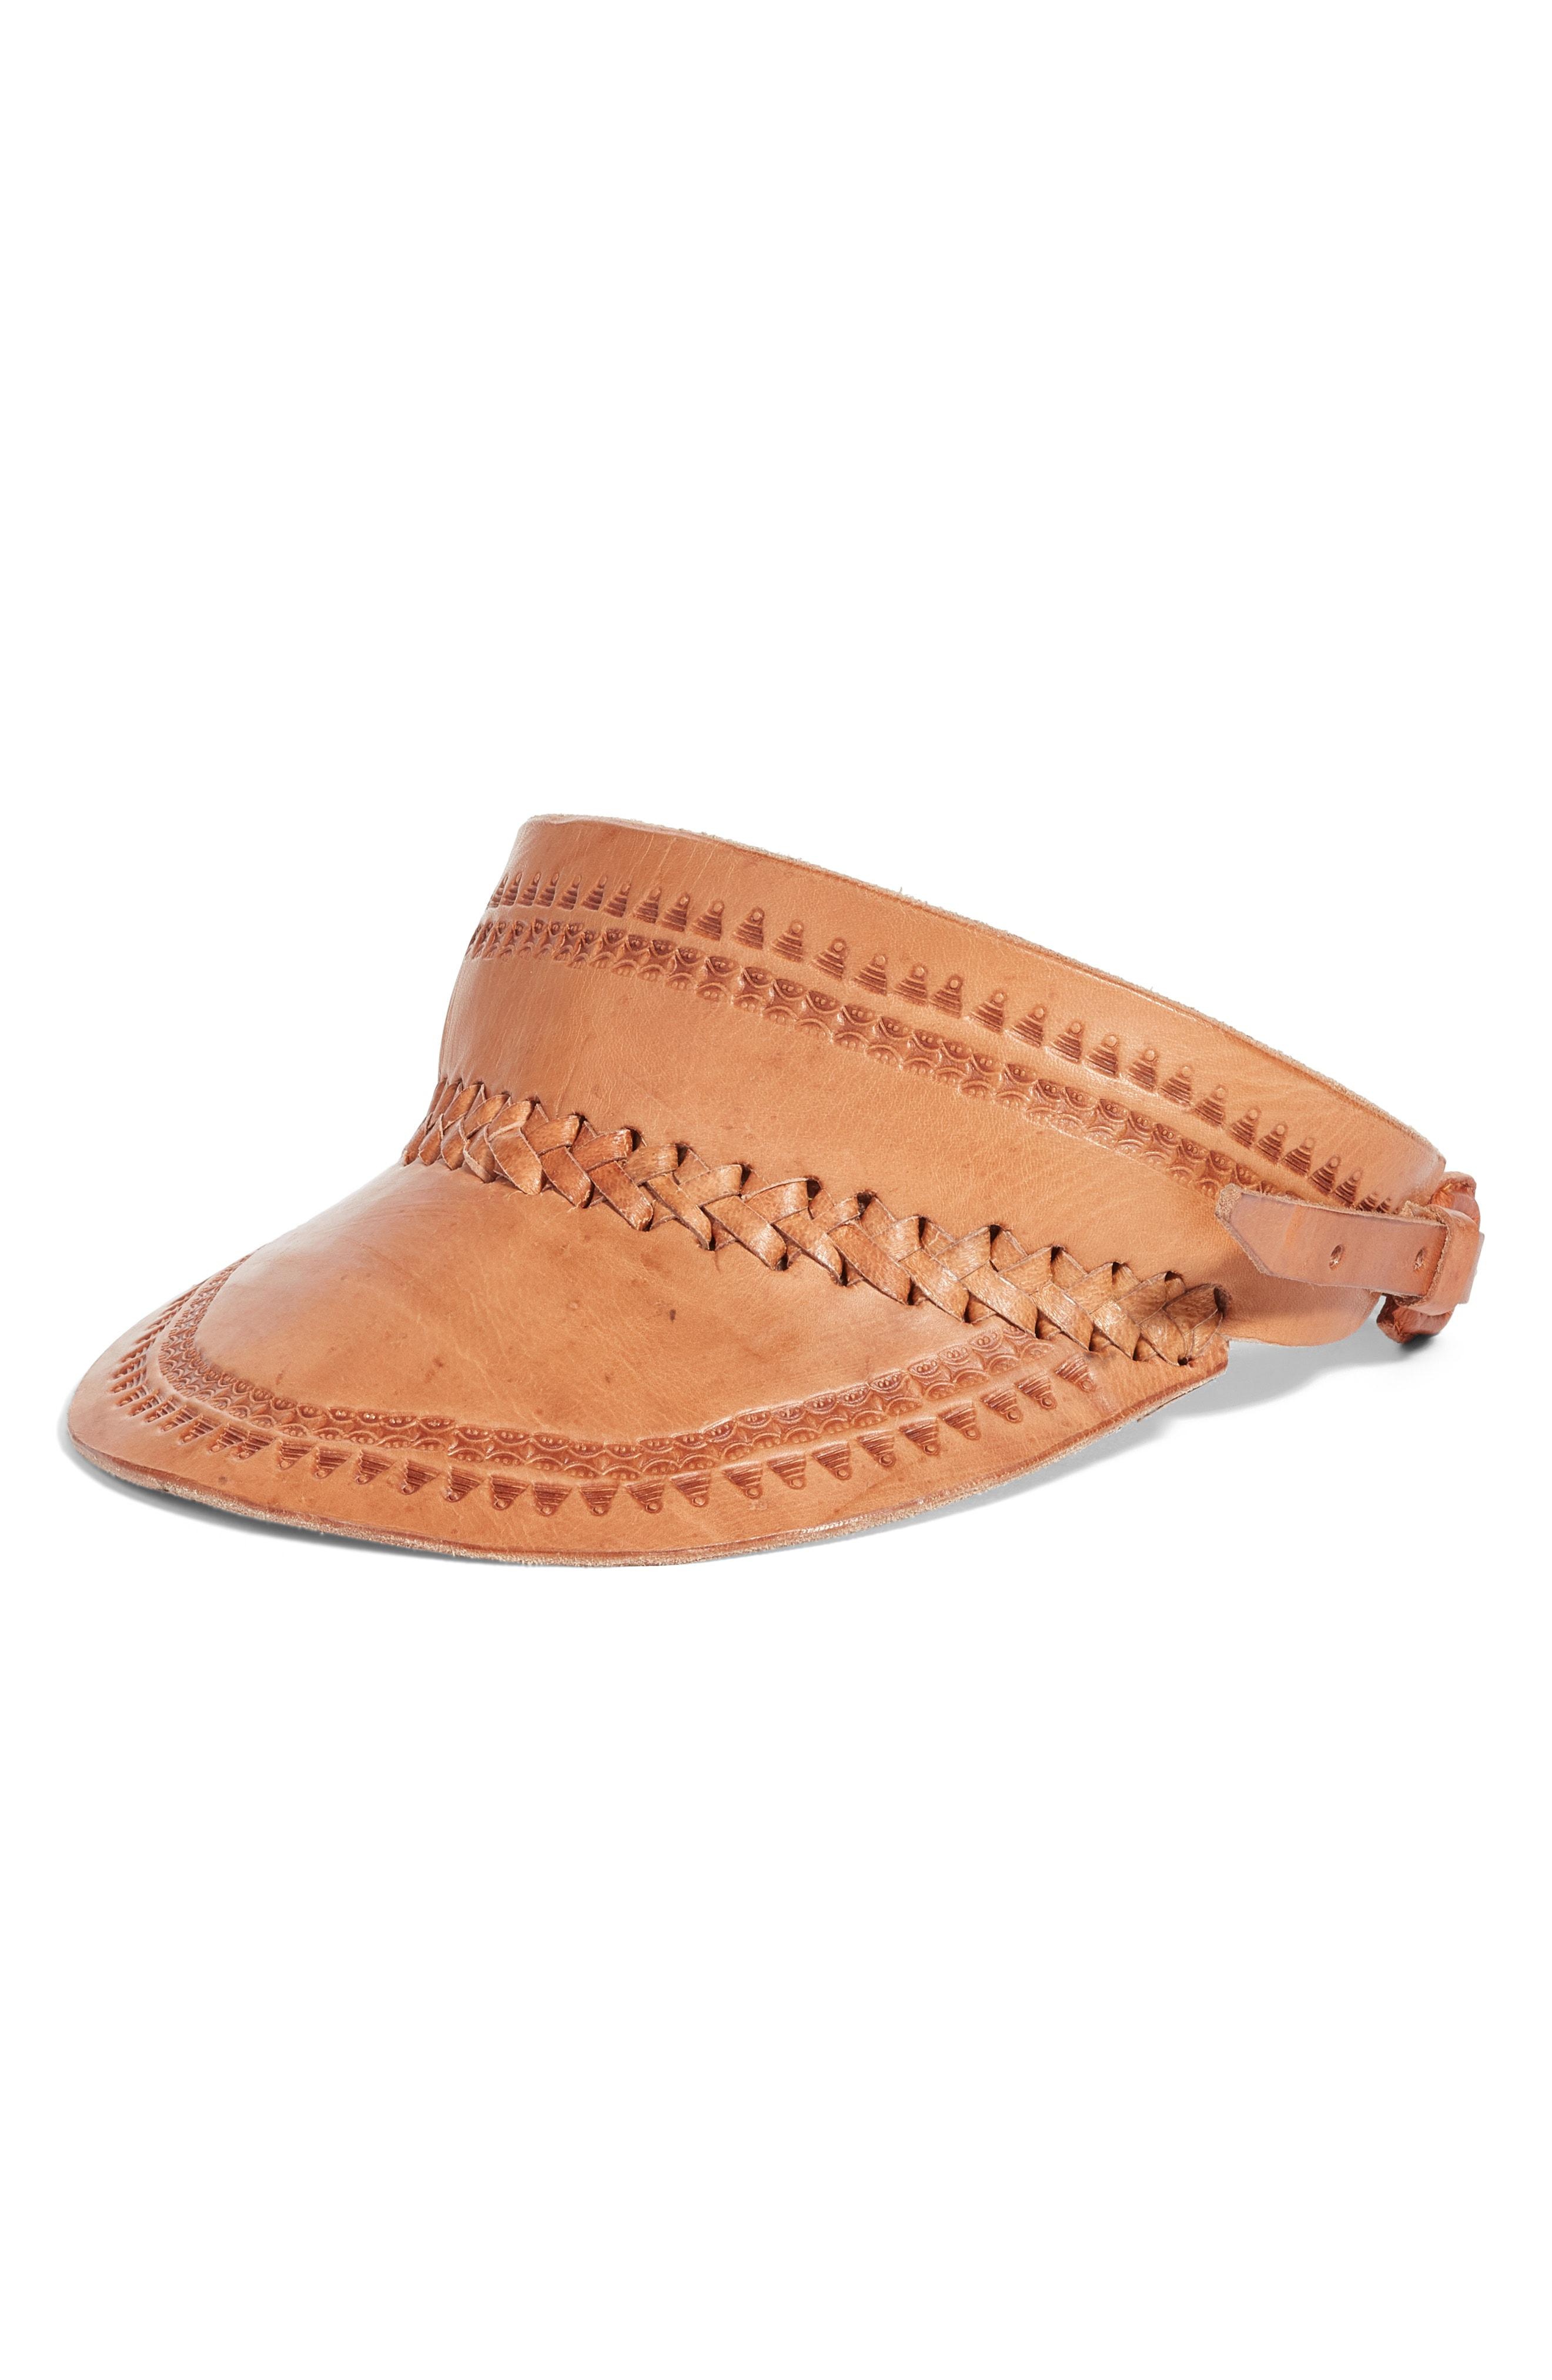 Siempre Viva Leather Visor